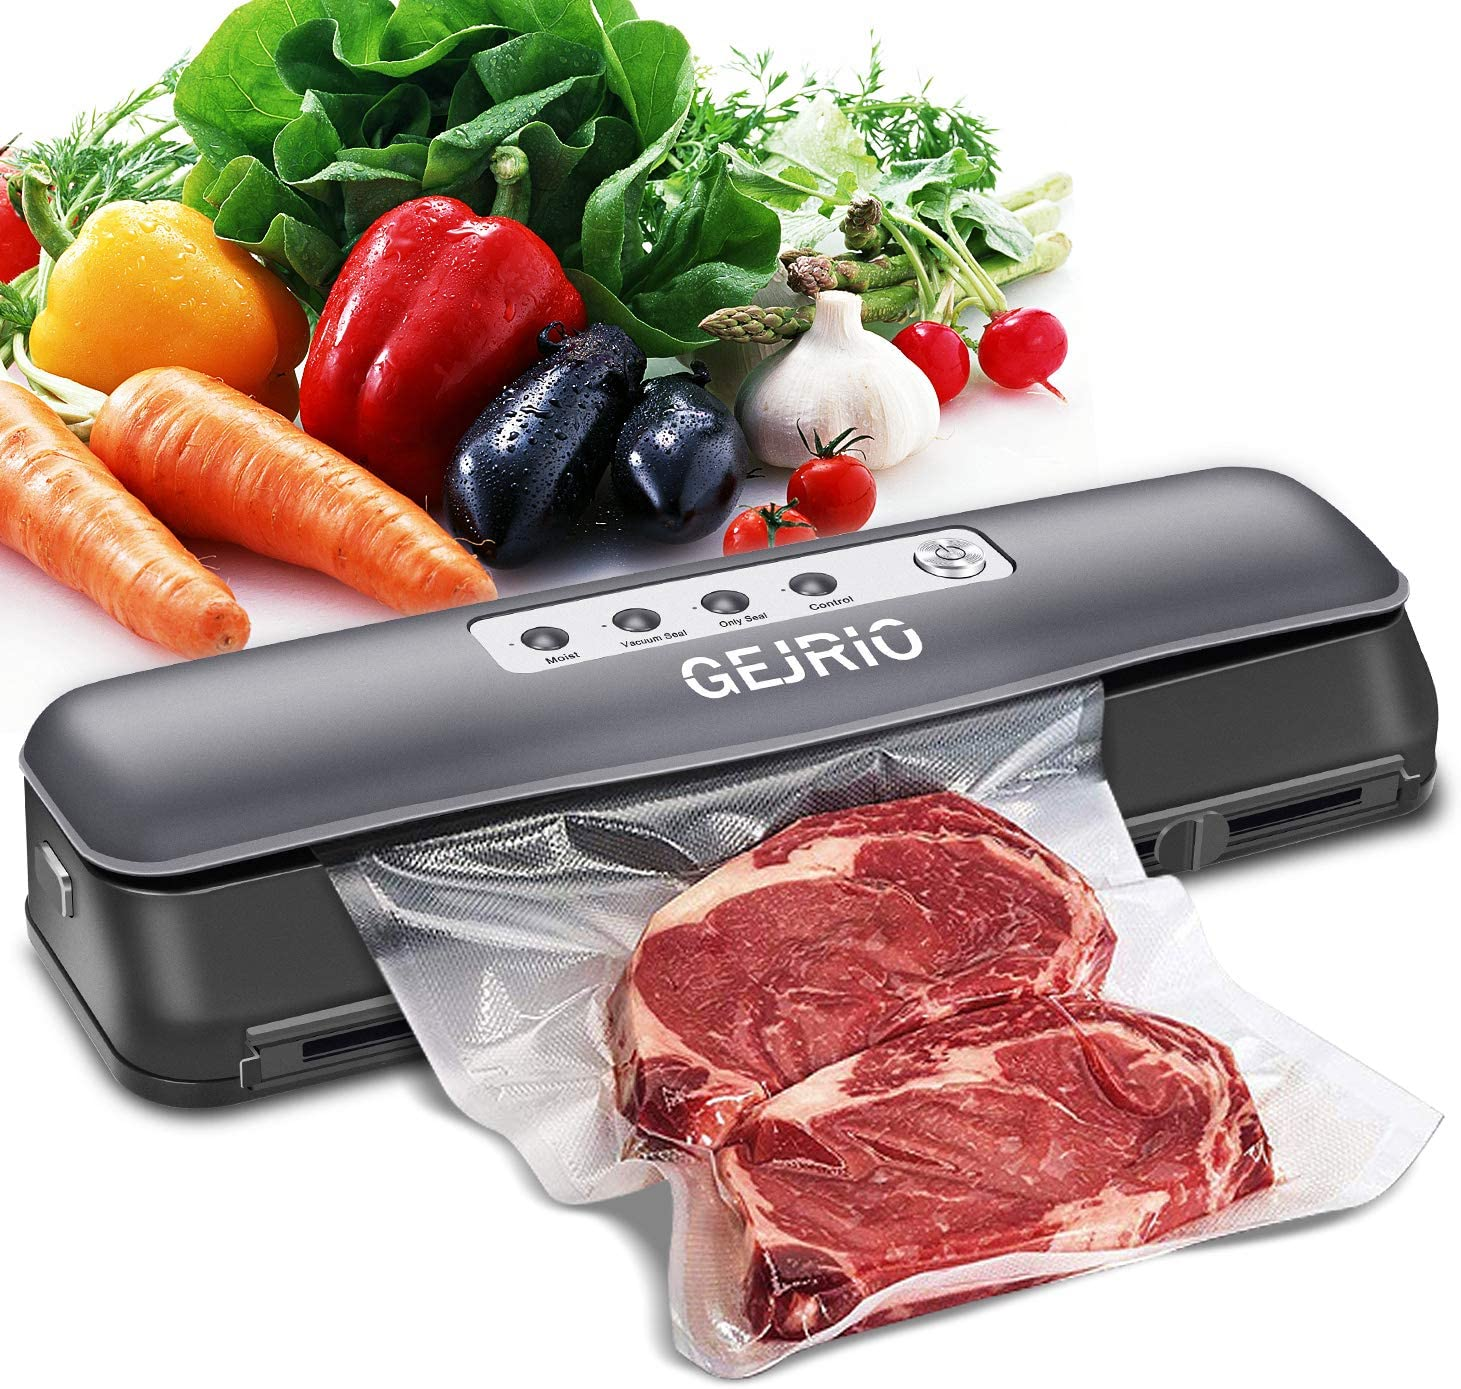 GEJRIO Vacuum Sealer Machine for Sav Food Lowest price challenge Surprise price Automatic